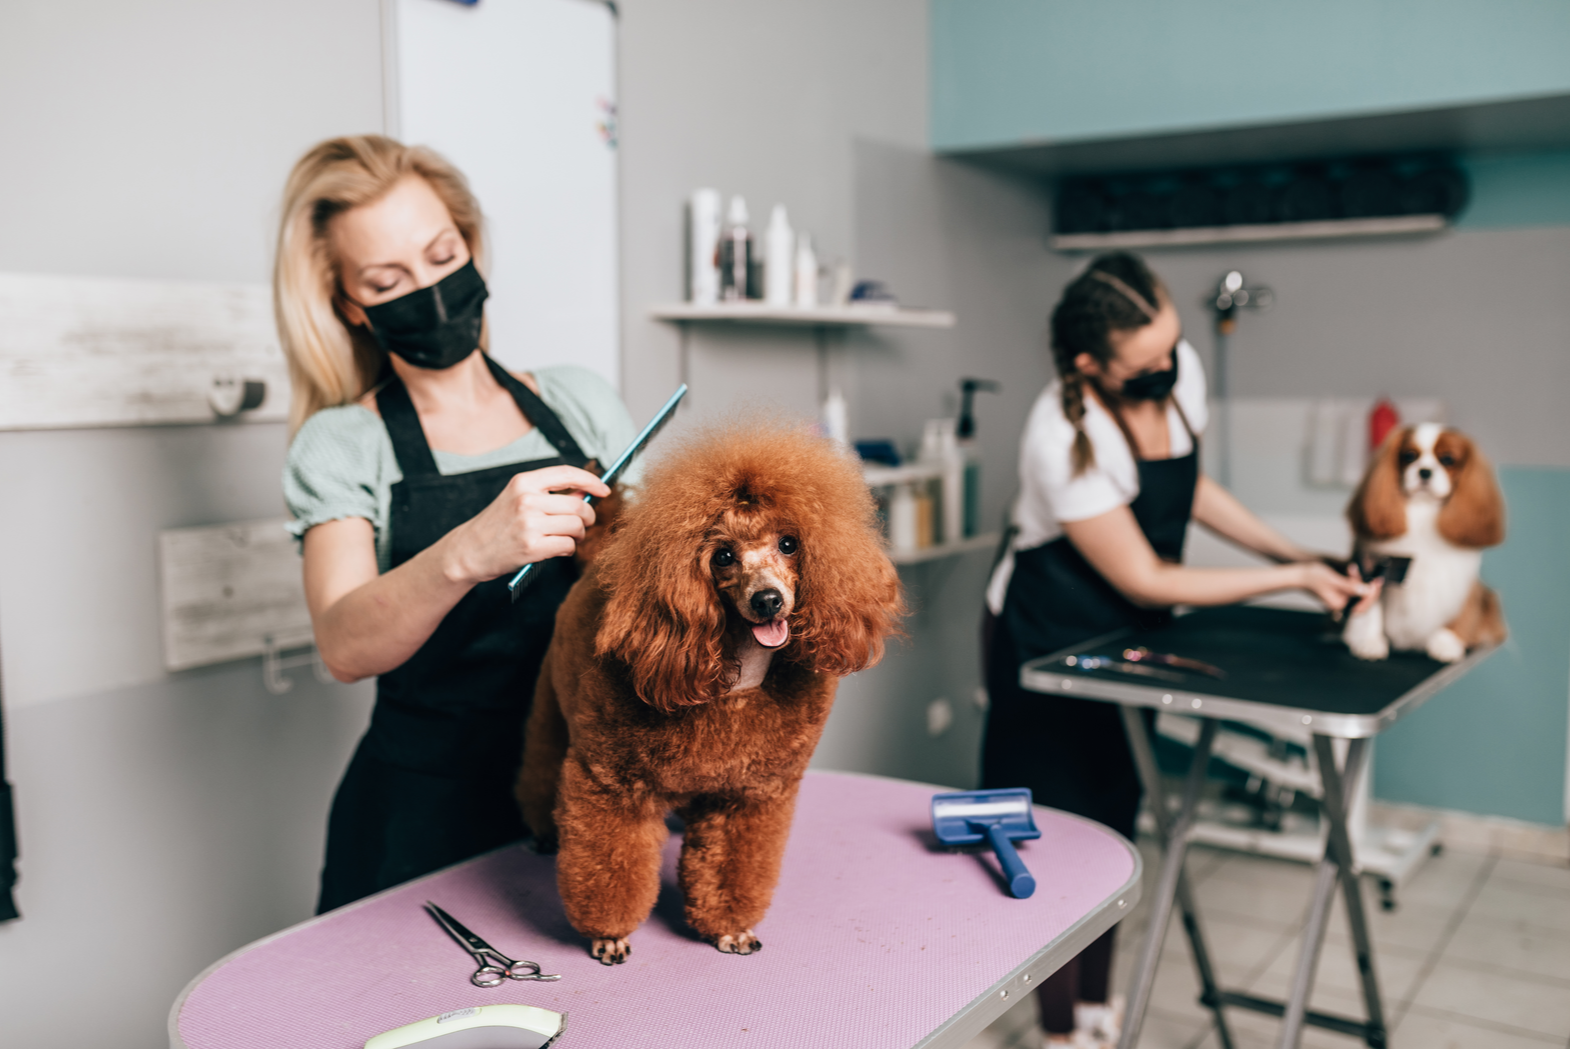 DIY dog grooming versus hiring a dog groomer